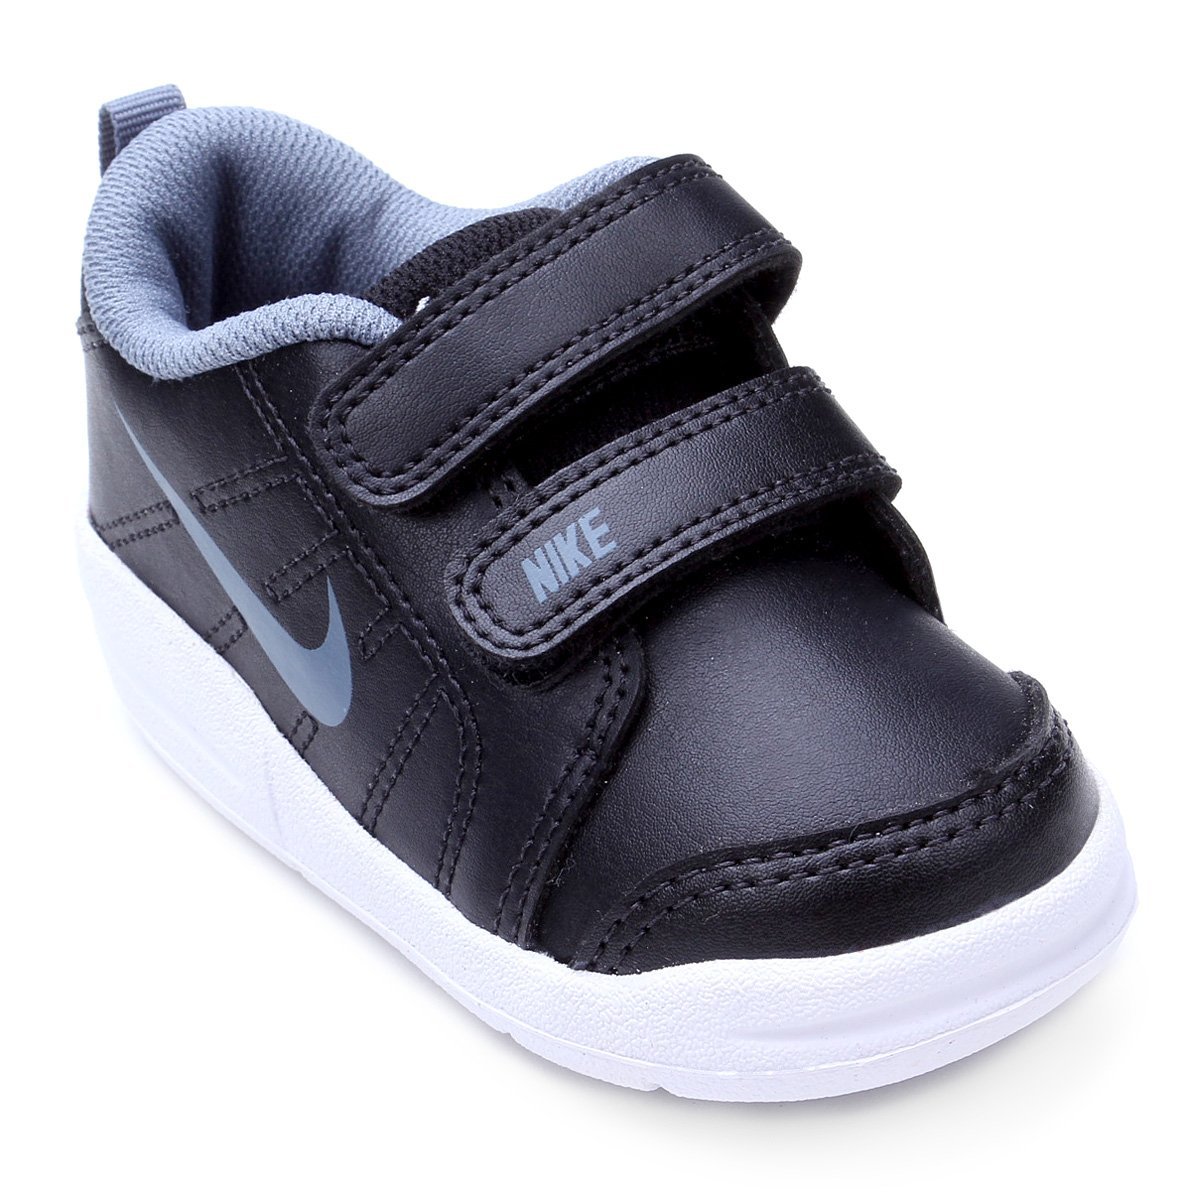 Tênis Infantil Nike Pico Lt Masculino - Tam: 21